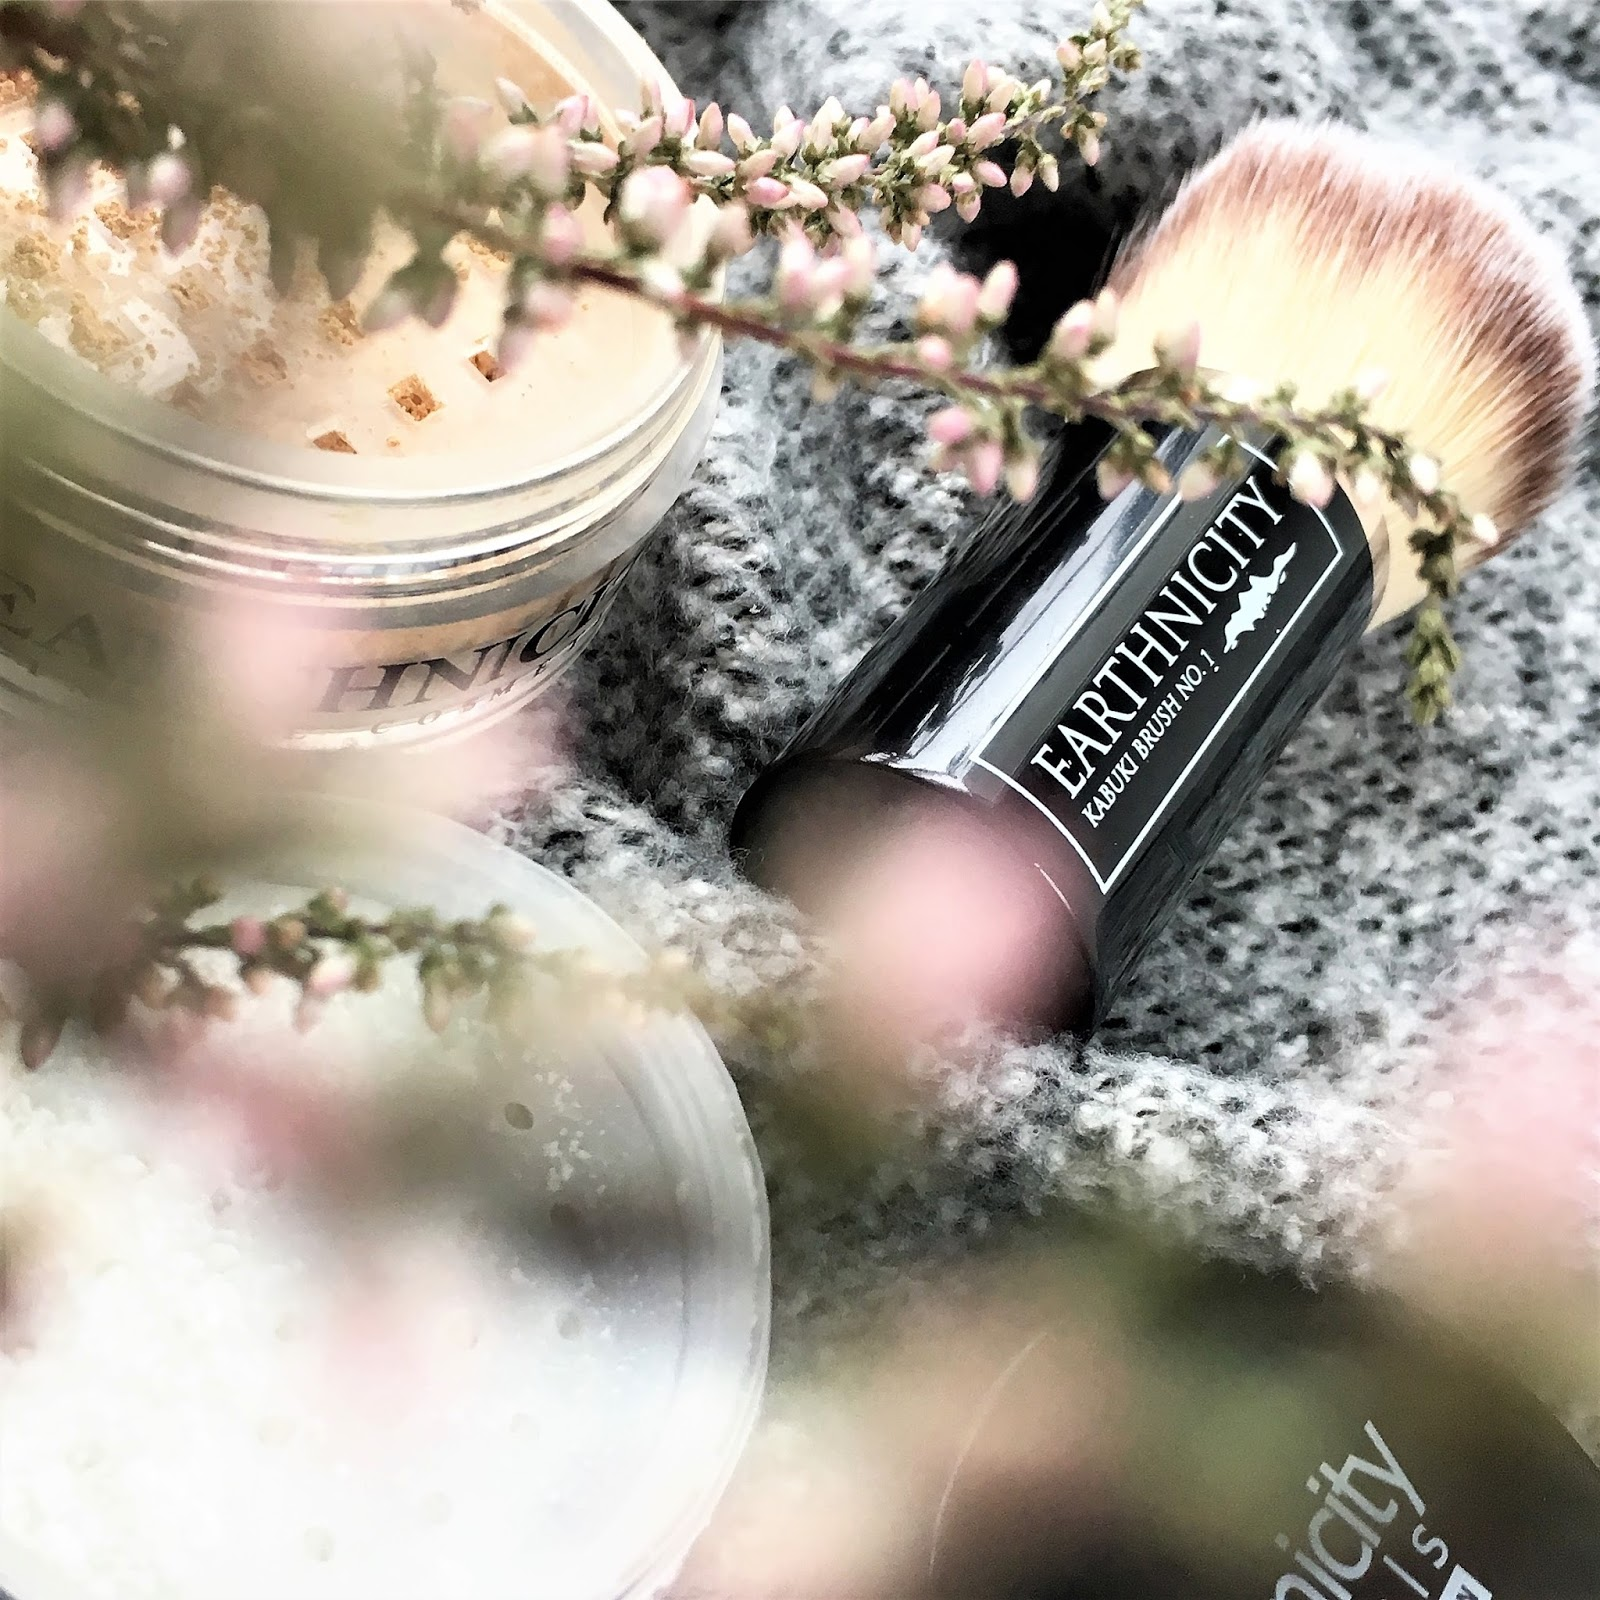 Naturalny makijaż twarzy: podkład mineralny Earthnicity, puder Velvet HD i krem-baza